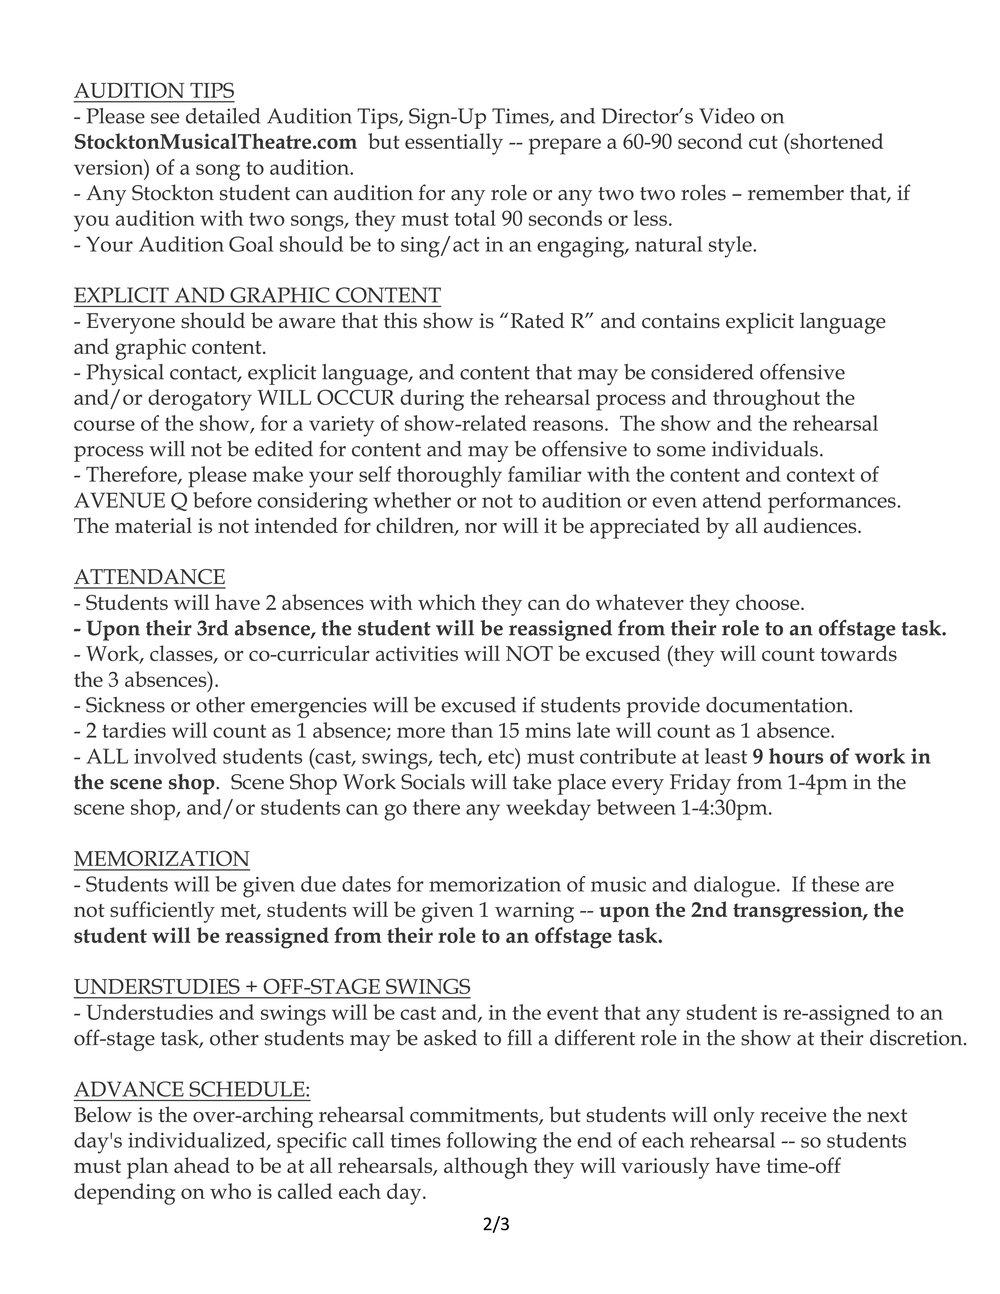 AVE Q attendance policy p2 JPG.jpg